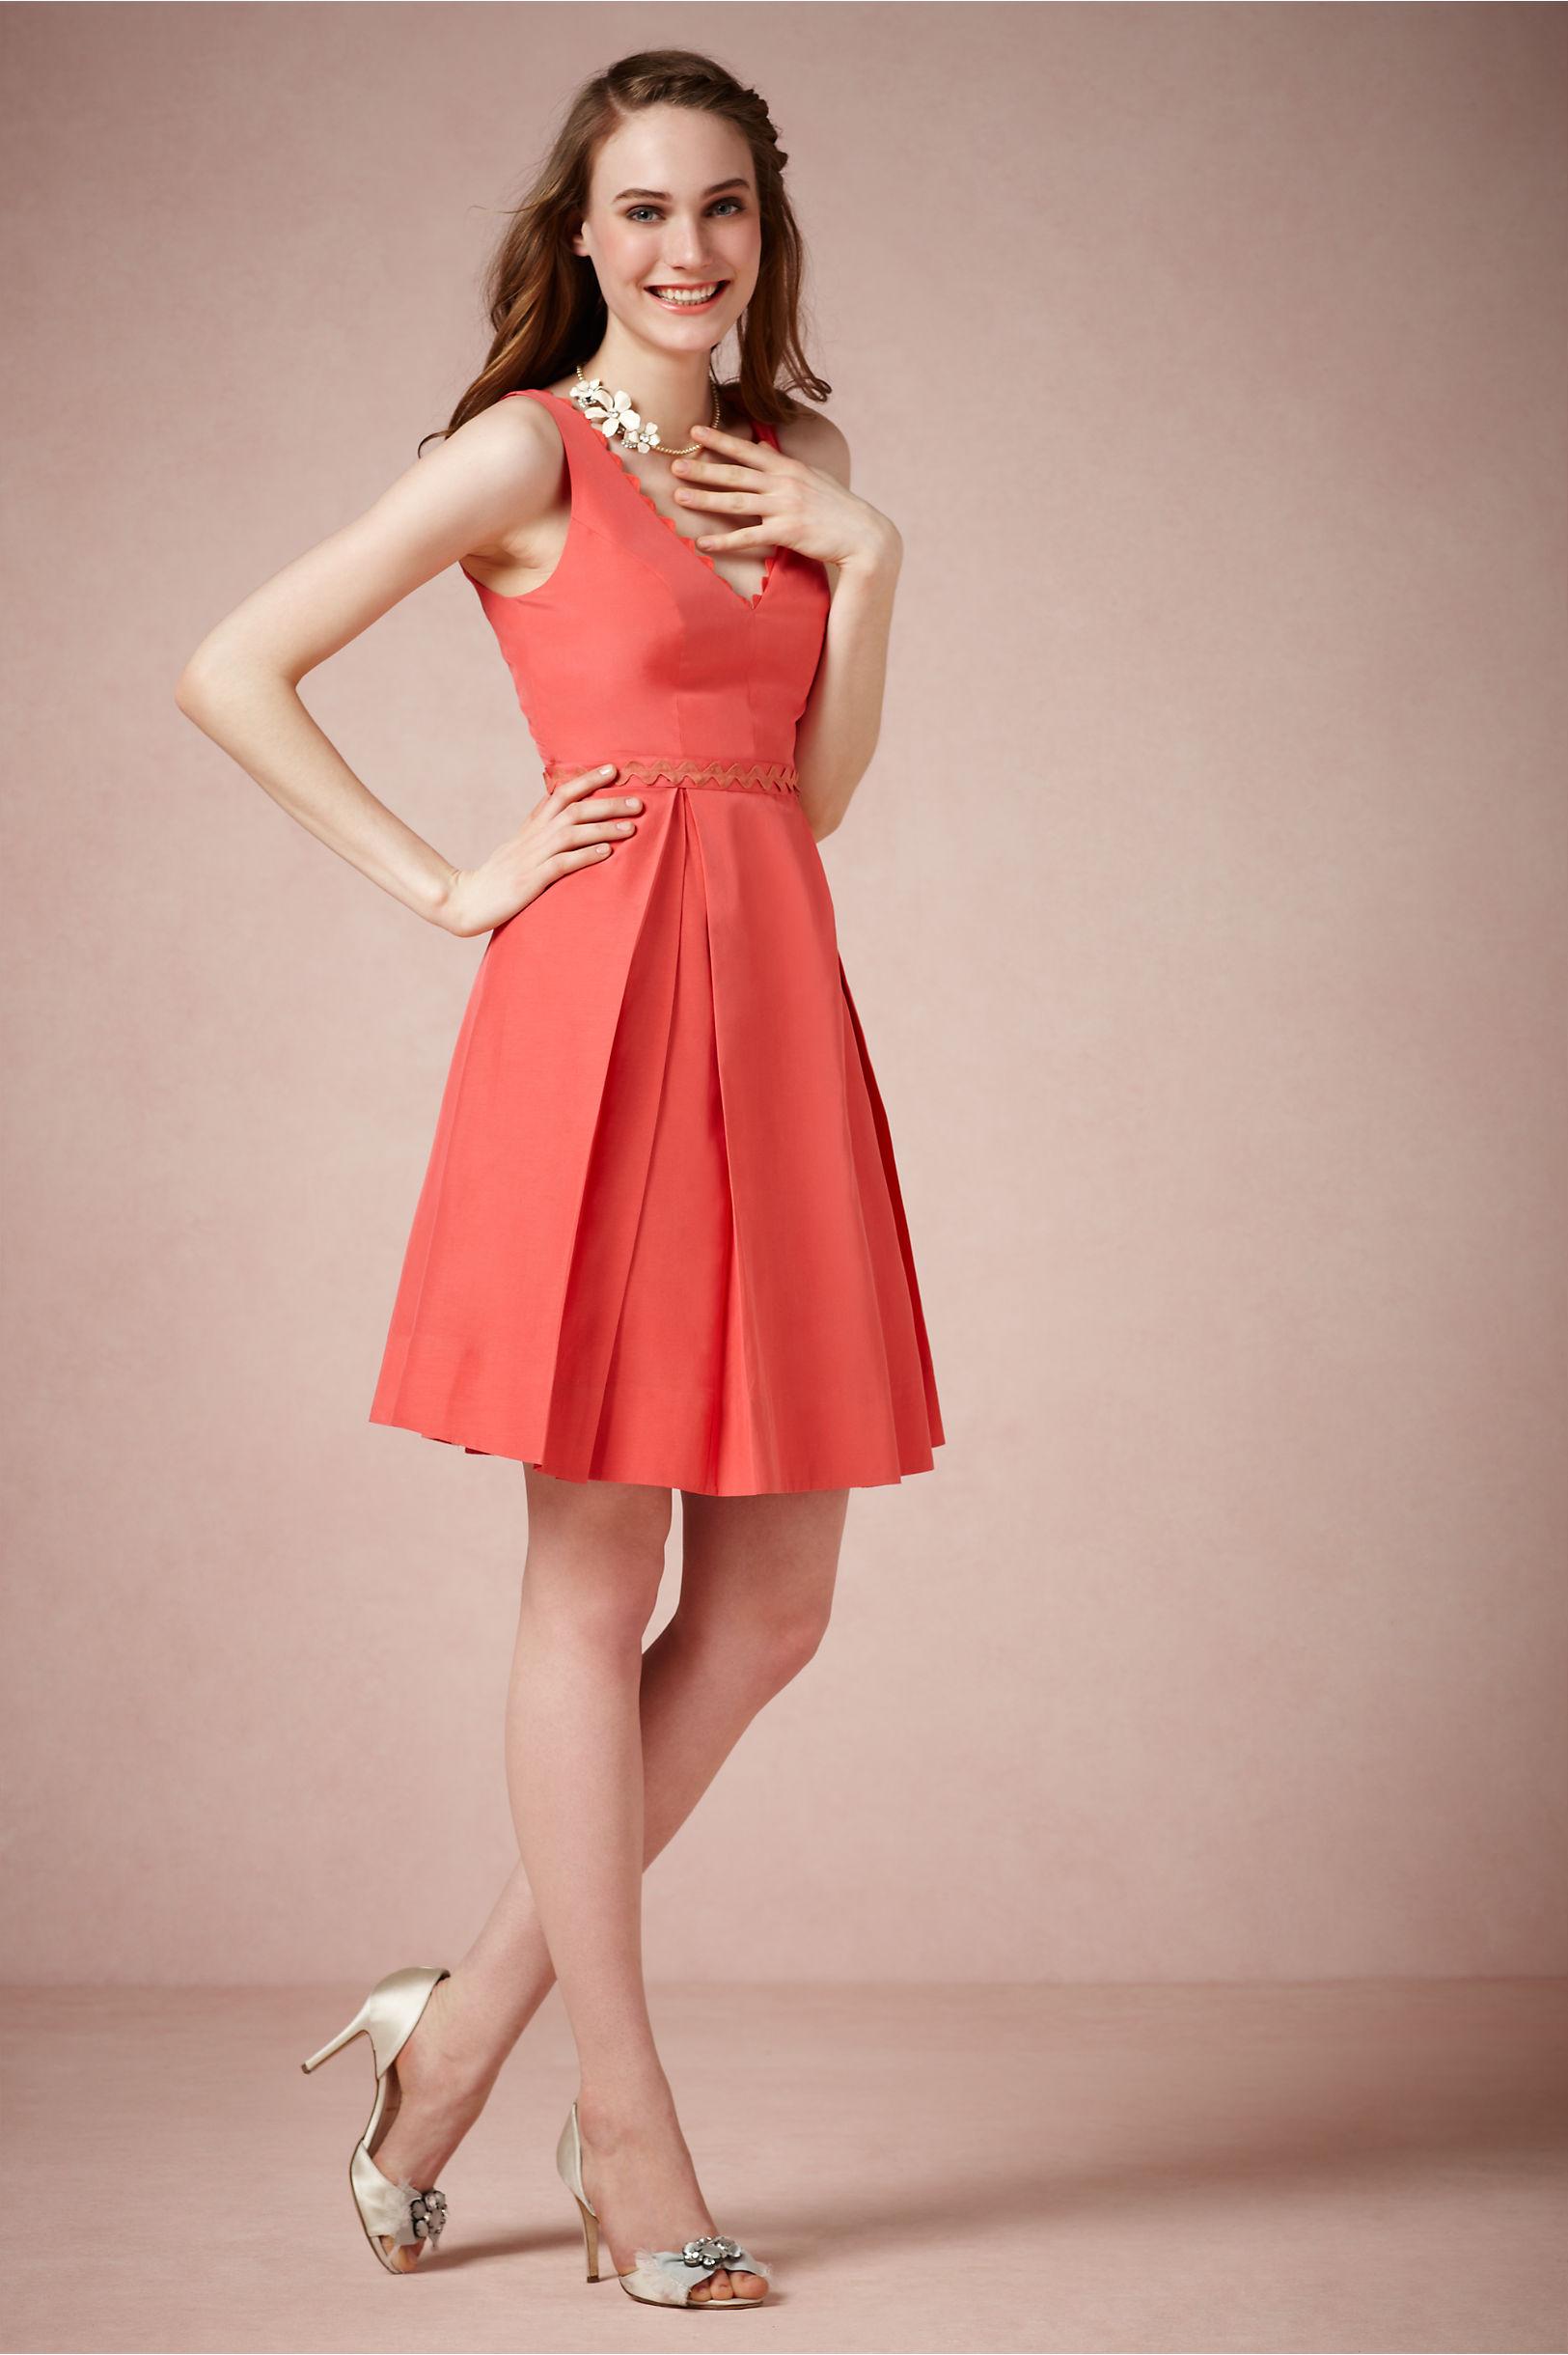 Calliope Dress in Sale | BHLDN